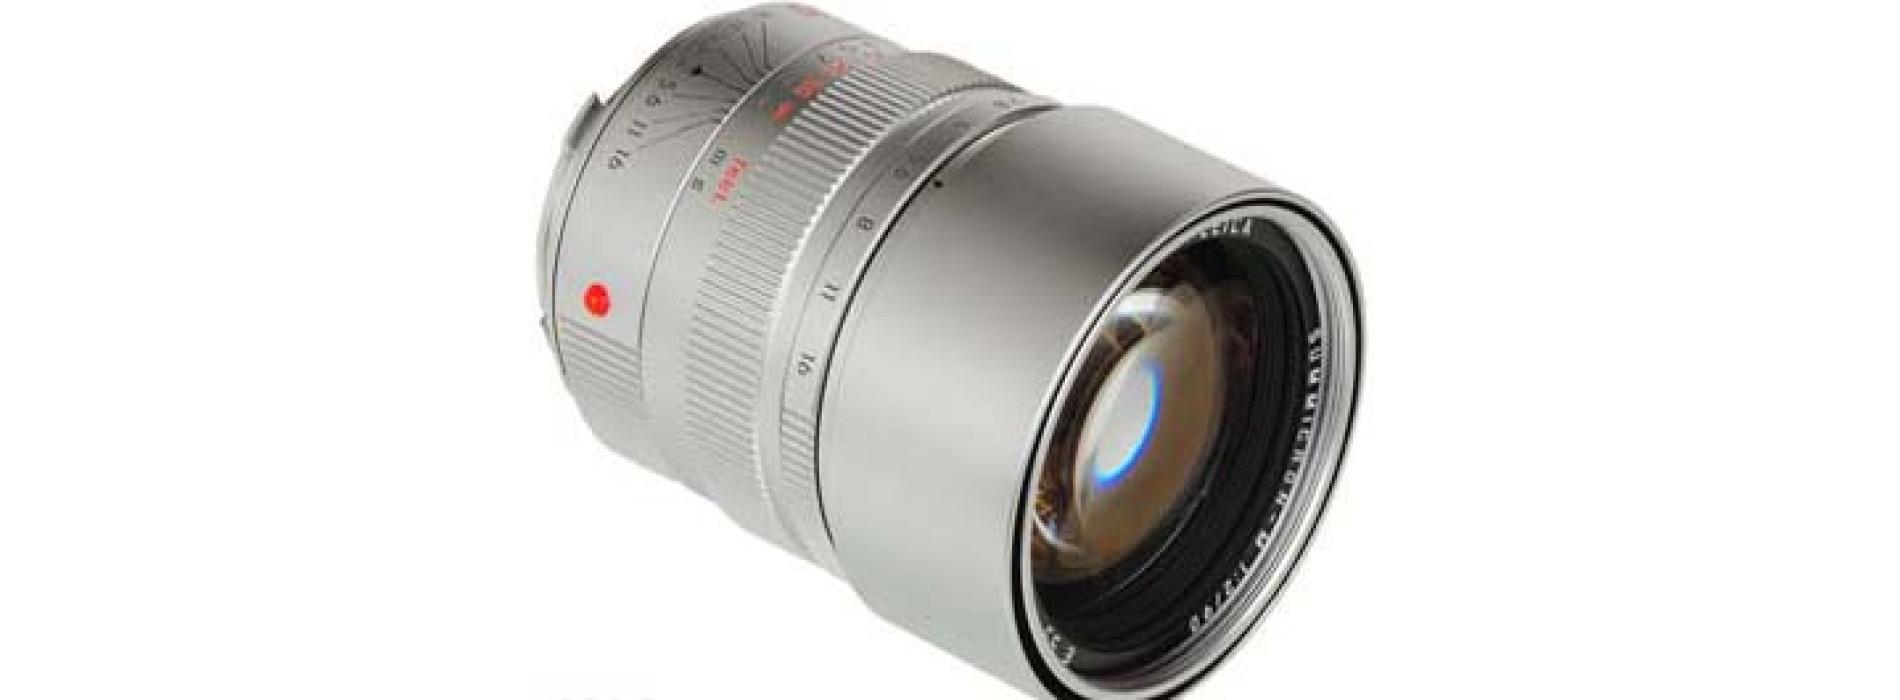 Ремонт объективов Leica